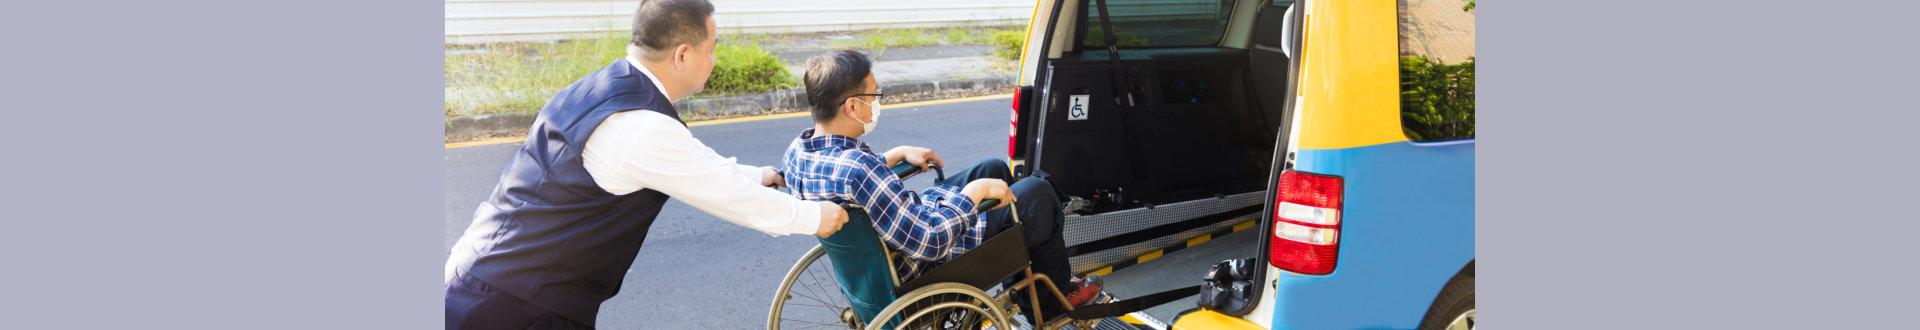 man assisting senior man to get into van